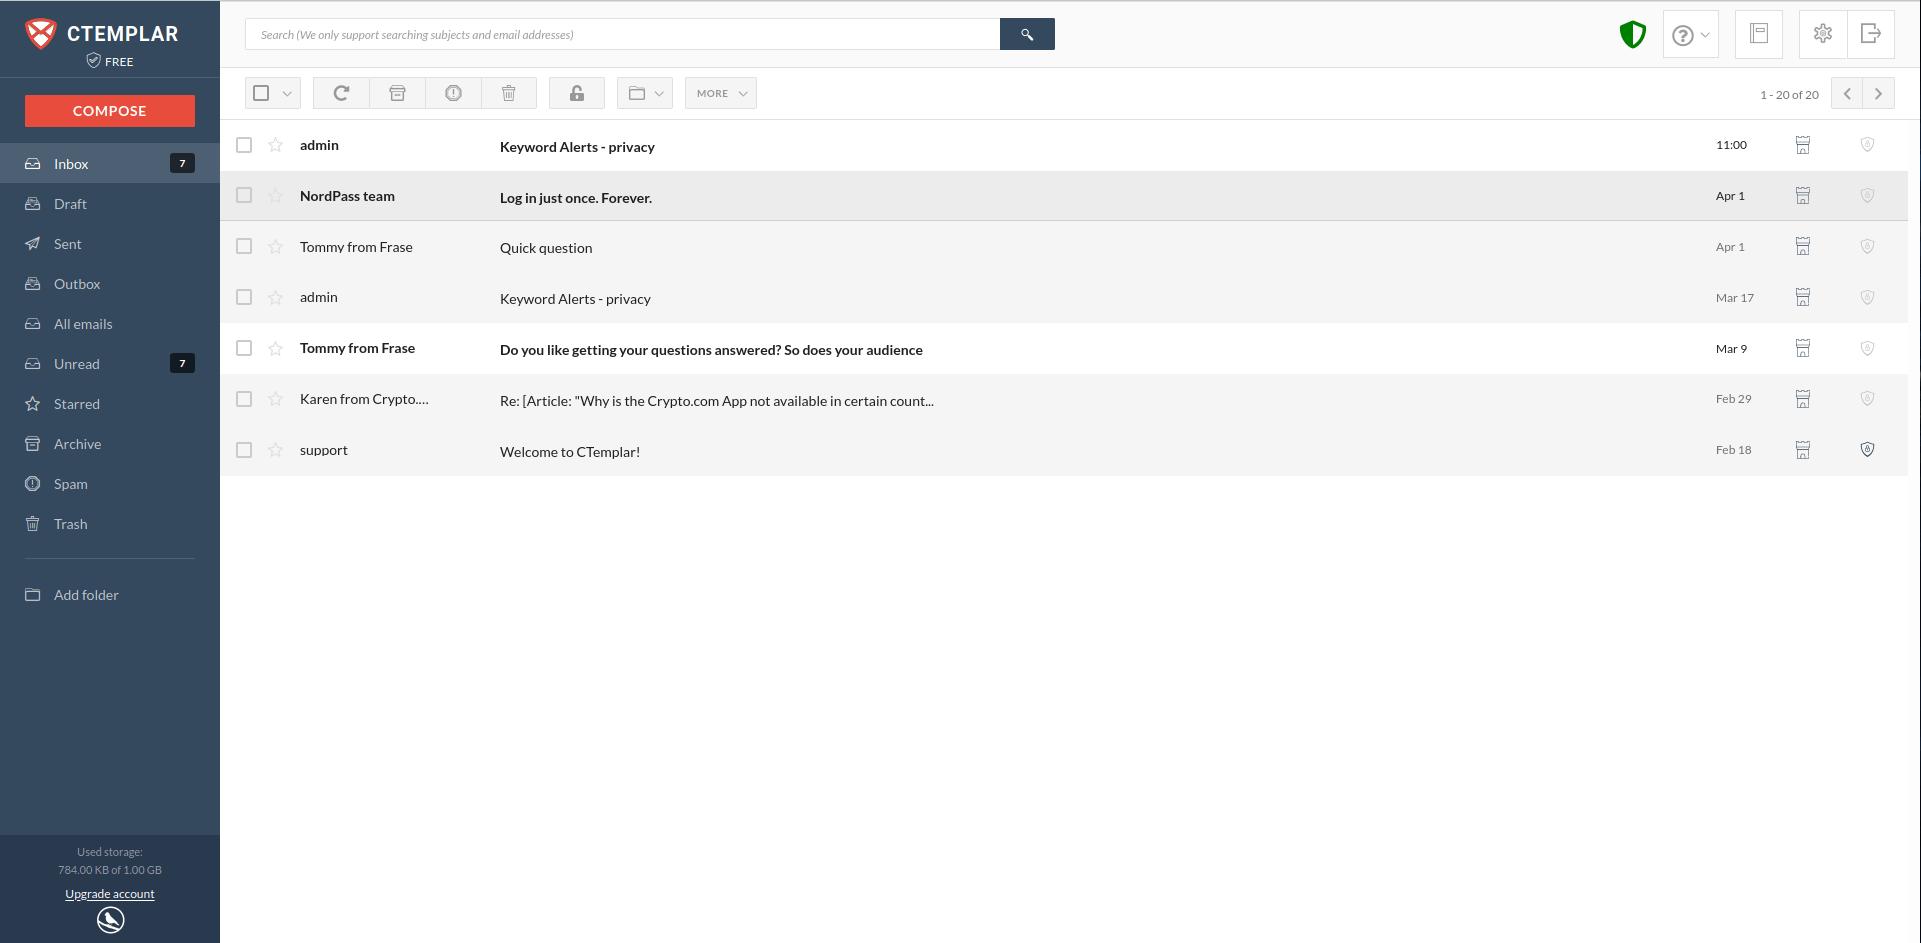 ctemplar inbox email